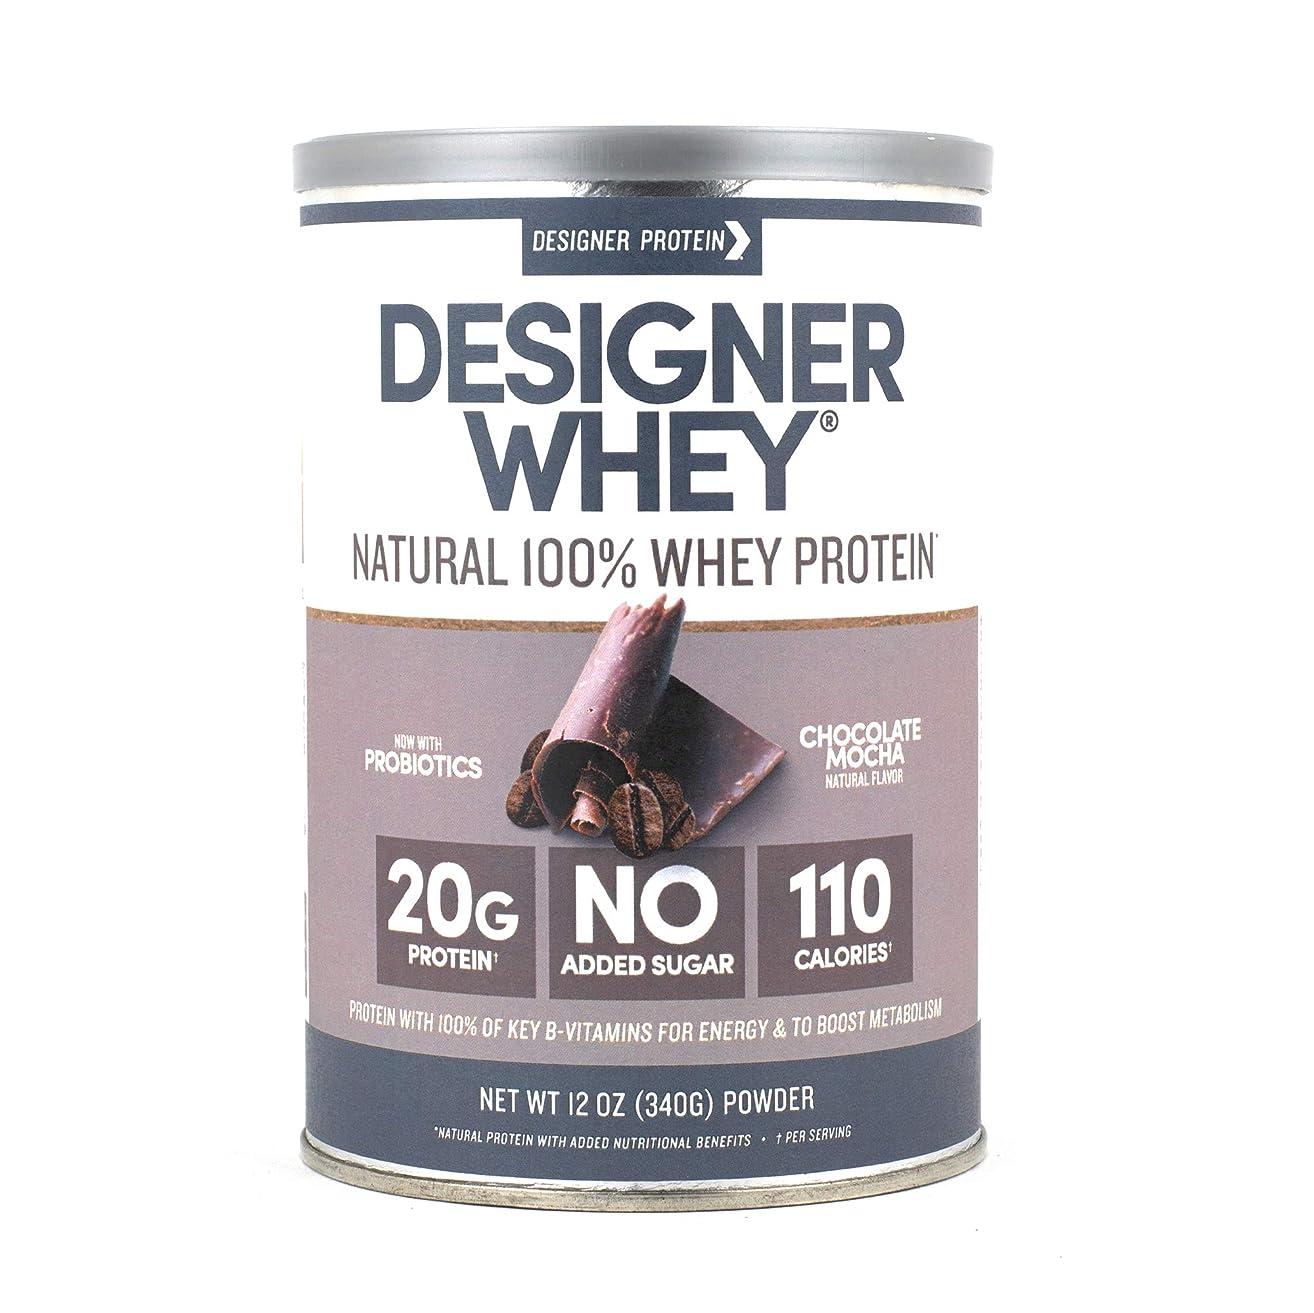 Designer Whey Protein Powder, Chocolate Mocha, 12 Ounce, Non GMO